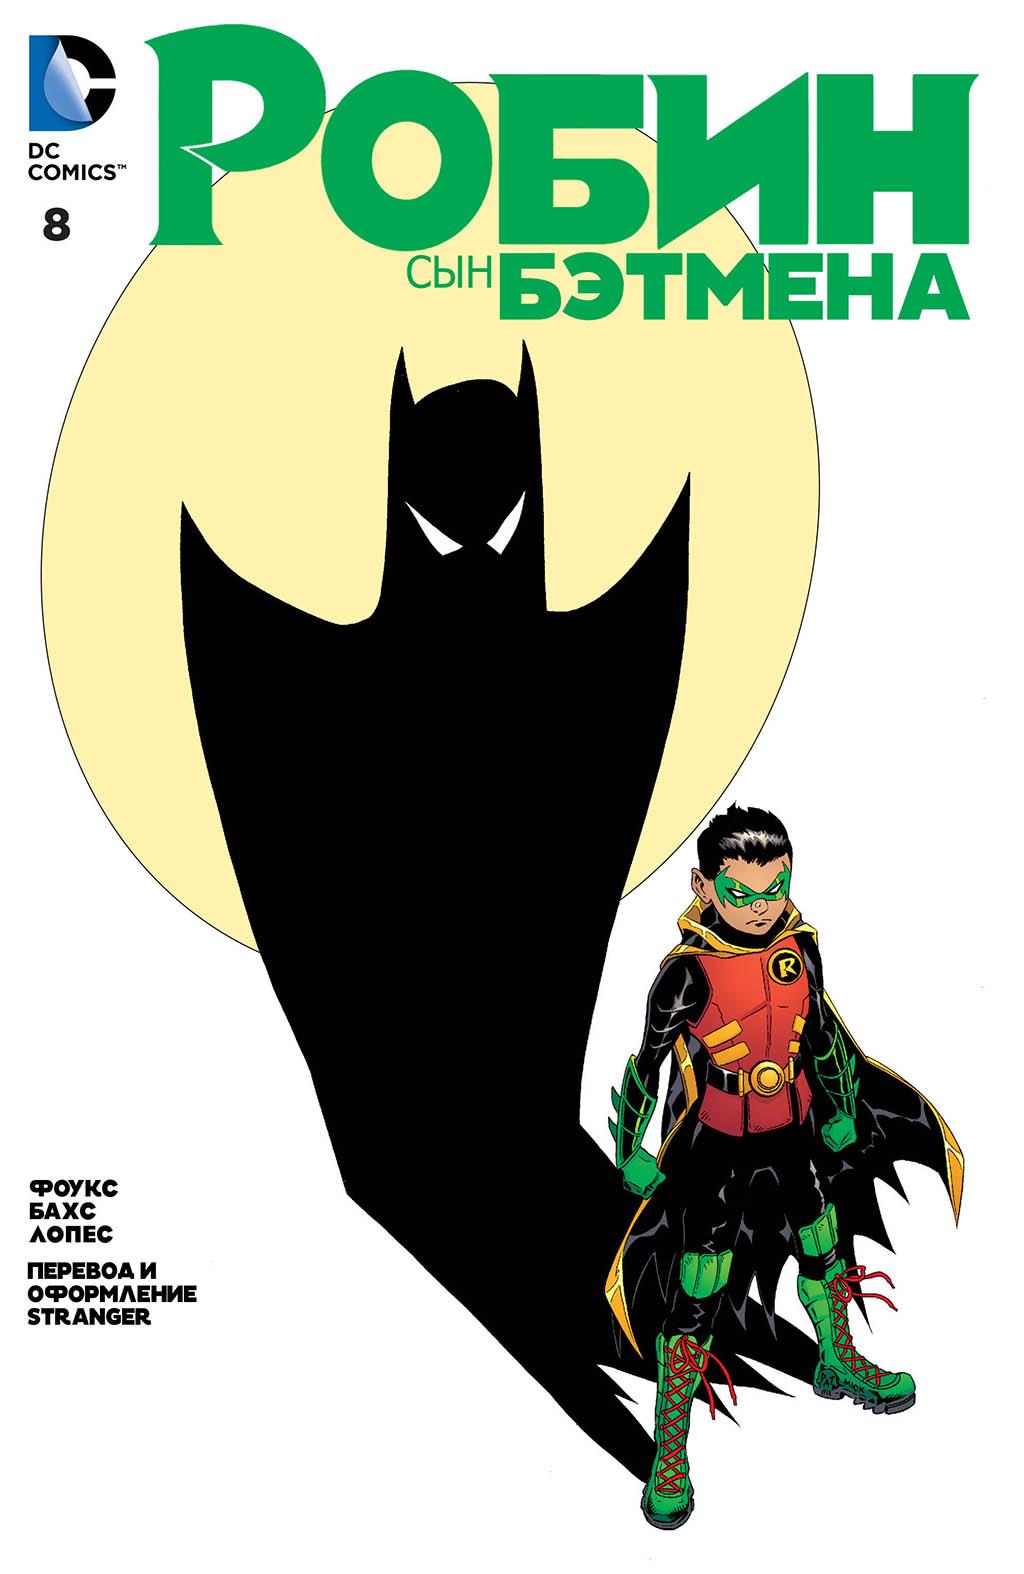 Комикс Робин - сын Бэтмена